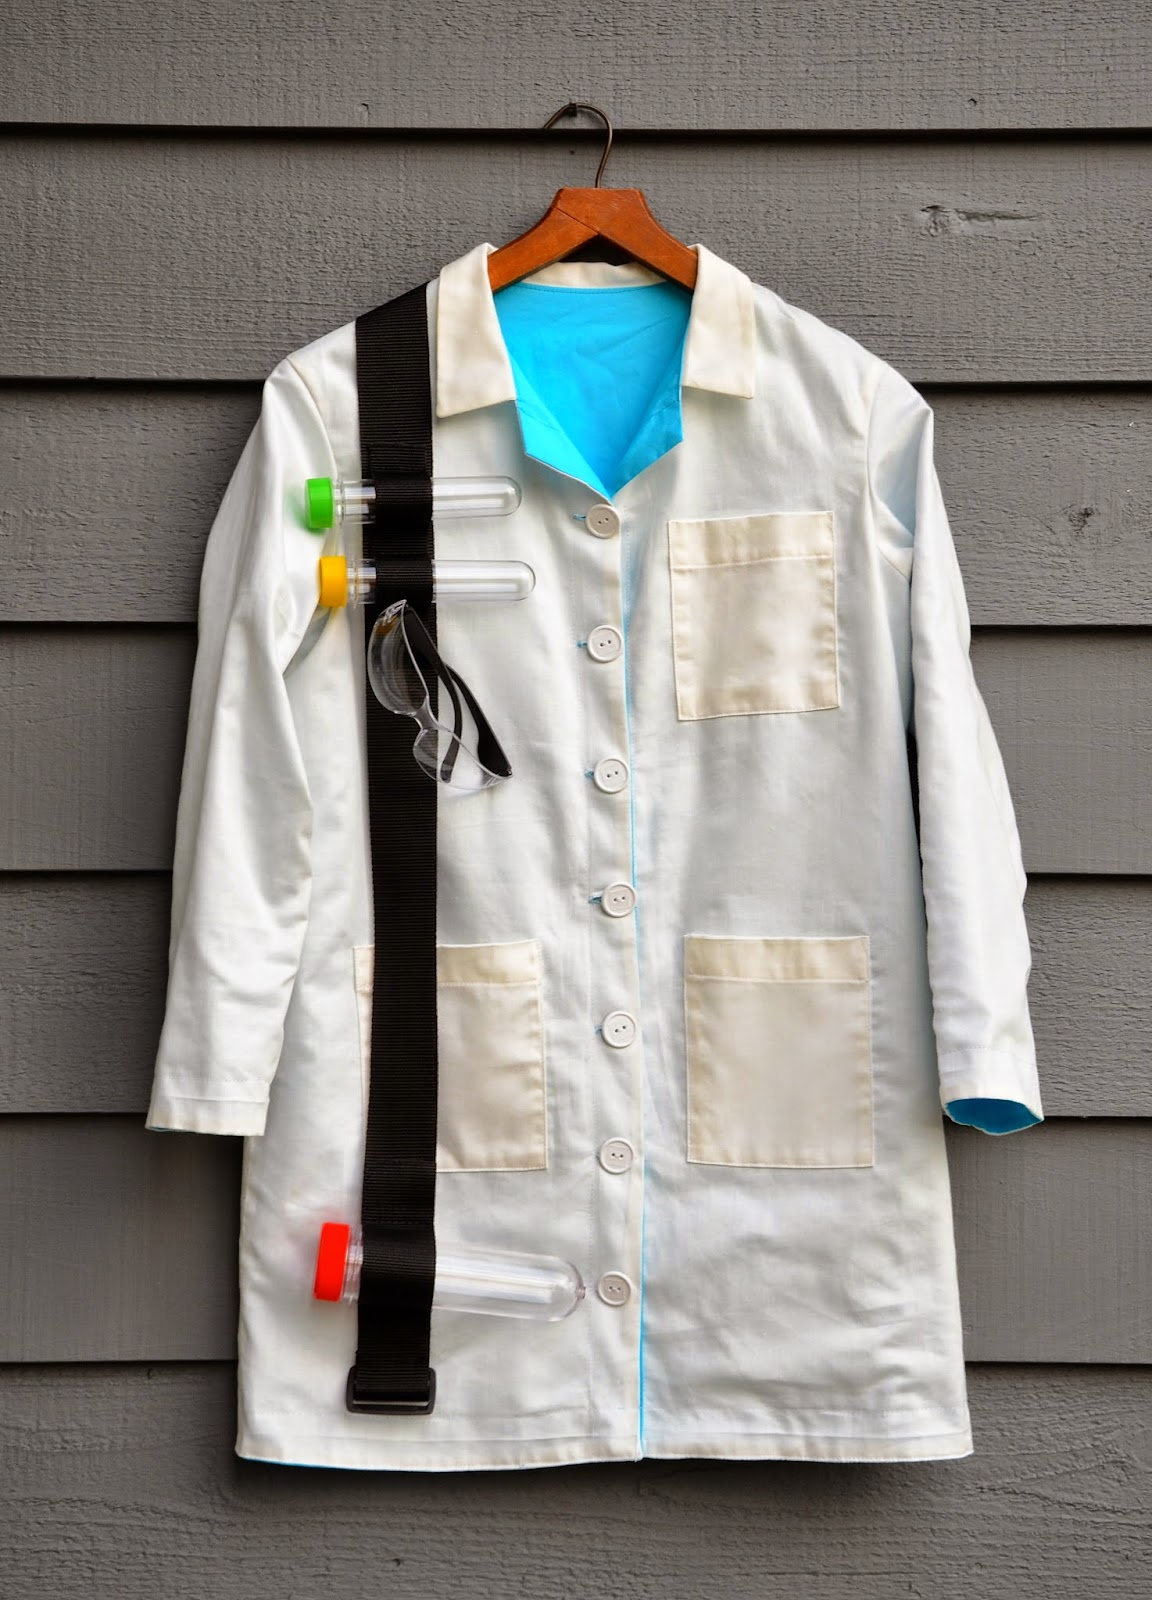 Ikat bag scientist tuesday november 4 2014 jeuxipadfo Gallery